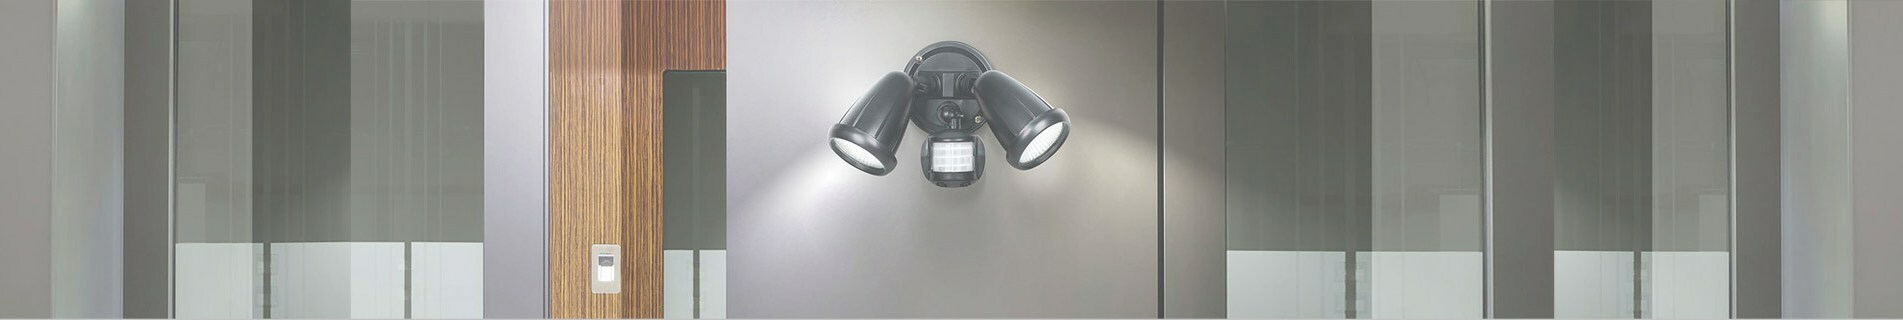 Security and Sensor Lighting